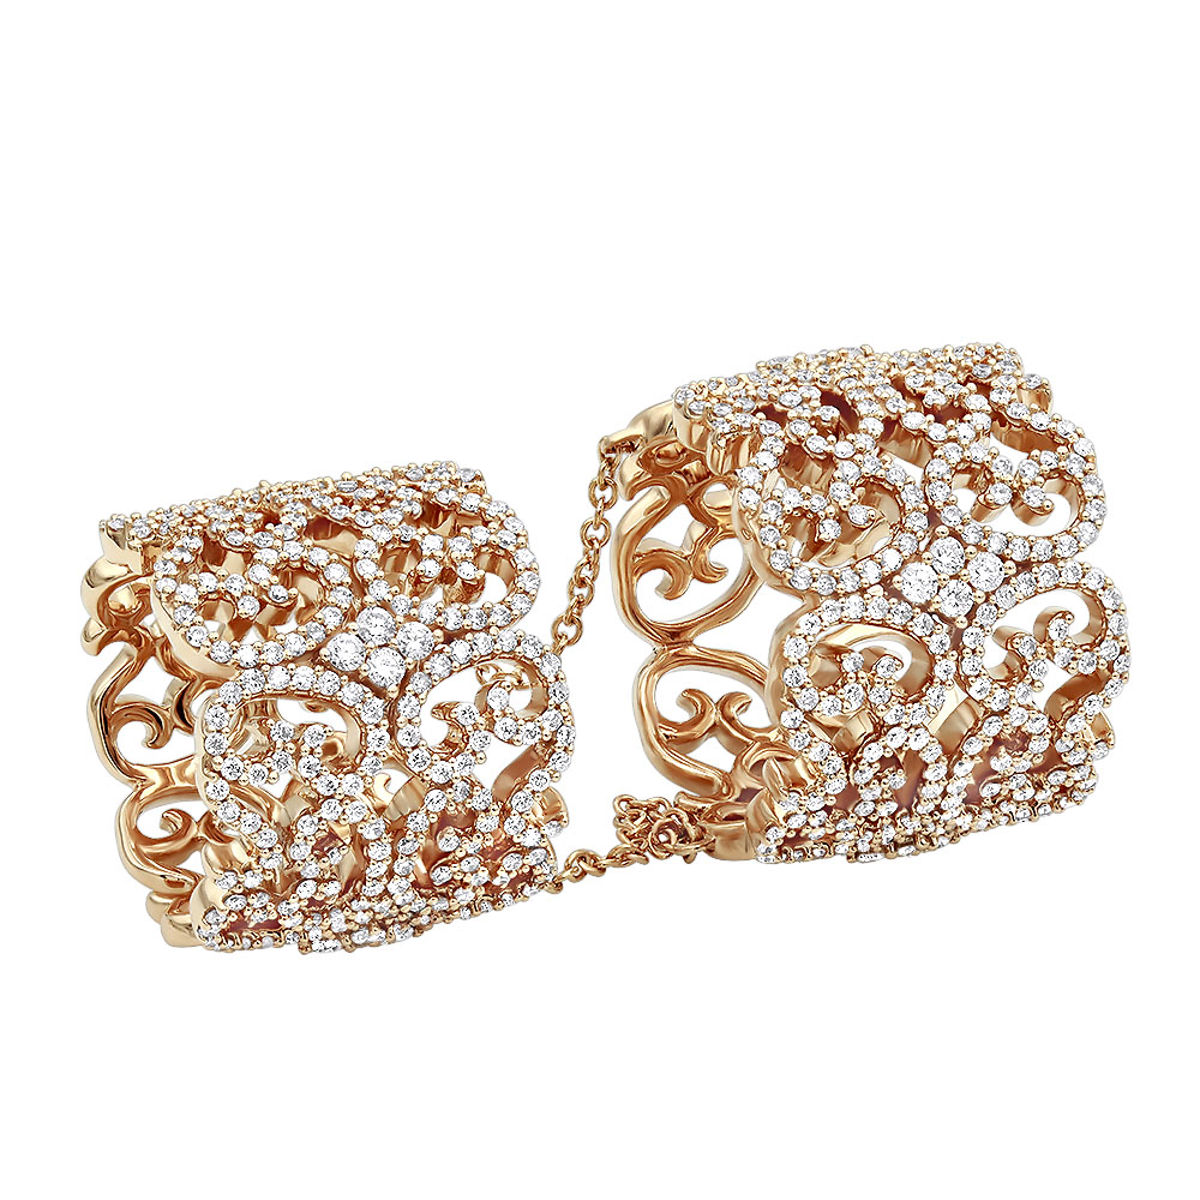 Full Finger Articulated Chain Linked Diamond Double Ring for Women 14k Gold